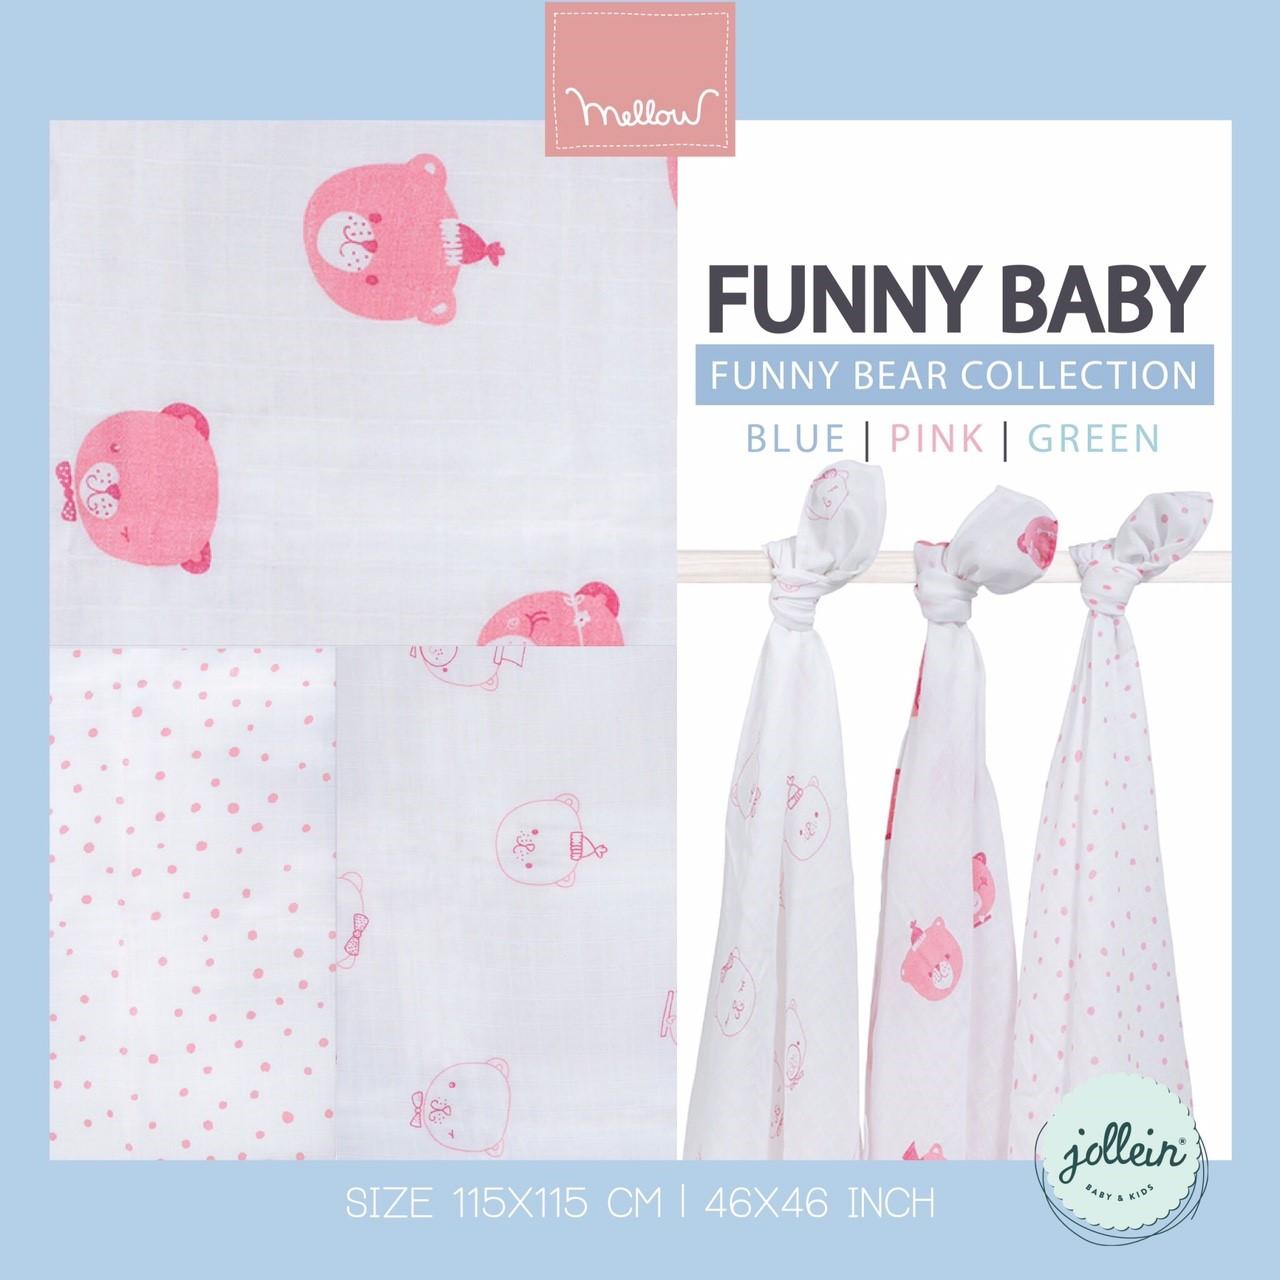 Jollein - Multi cloth Funny bear pink ผ้าห่อตัวลายหมีชมพู เซต 3 ผืน size 115x115 cm.